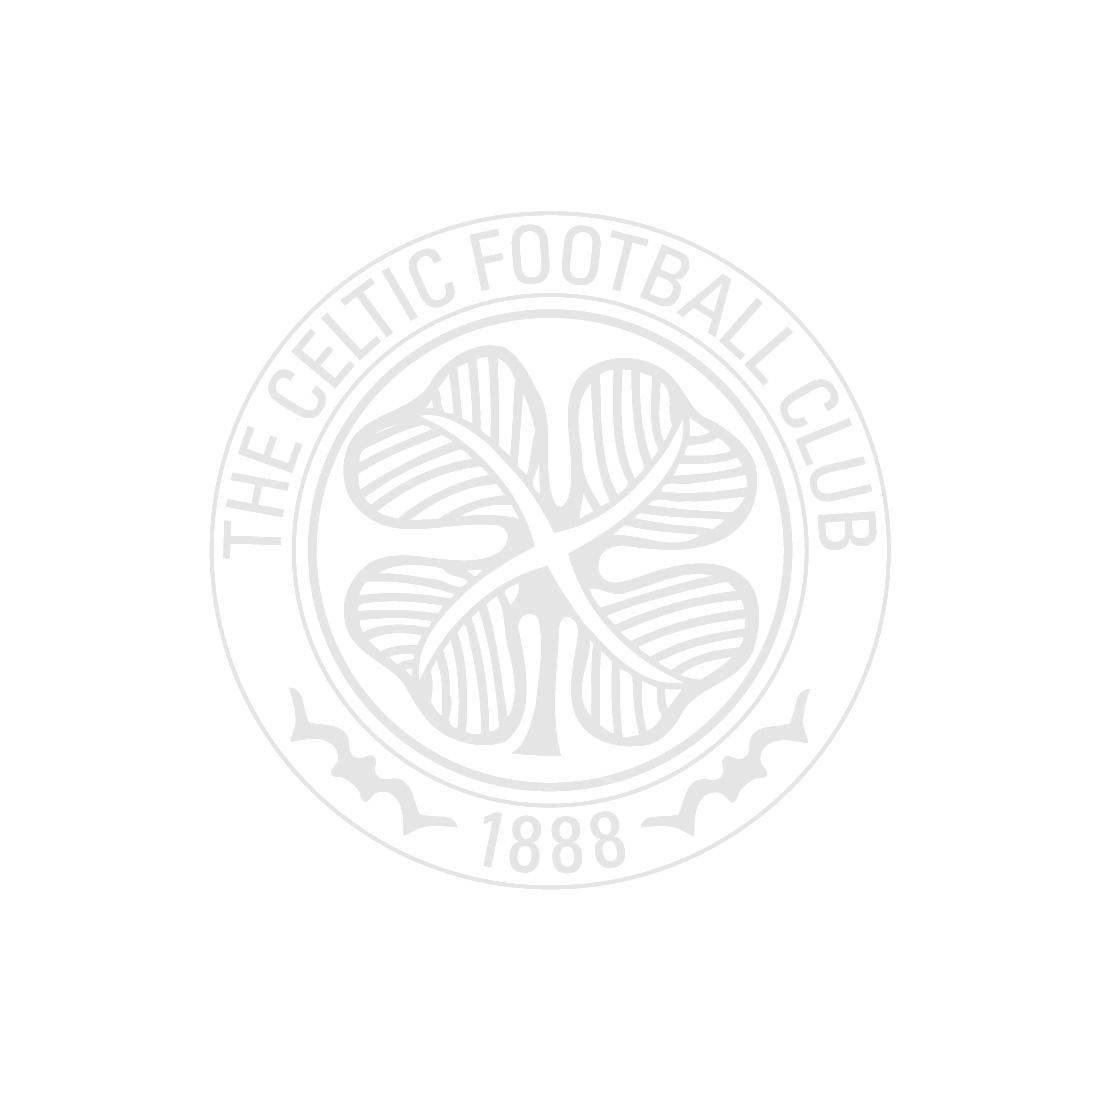 Celtic Broony DVD